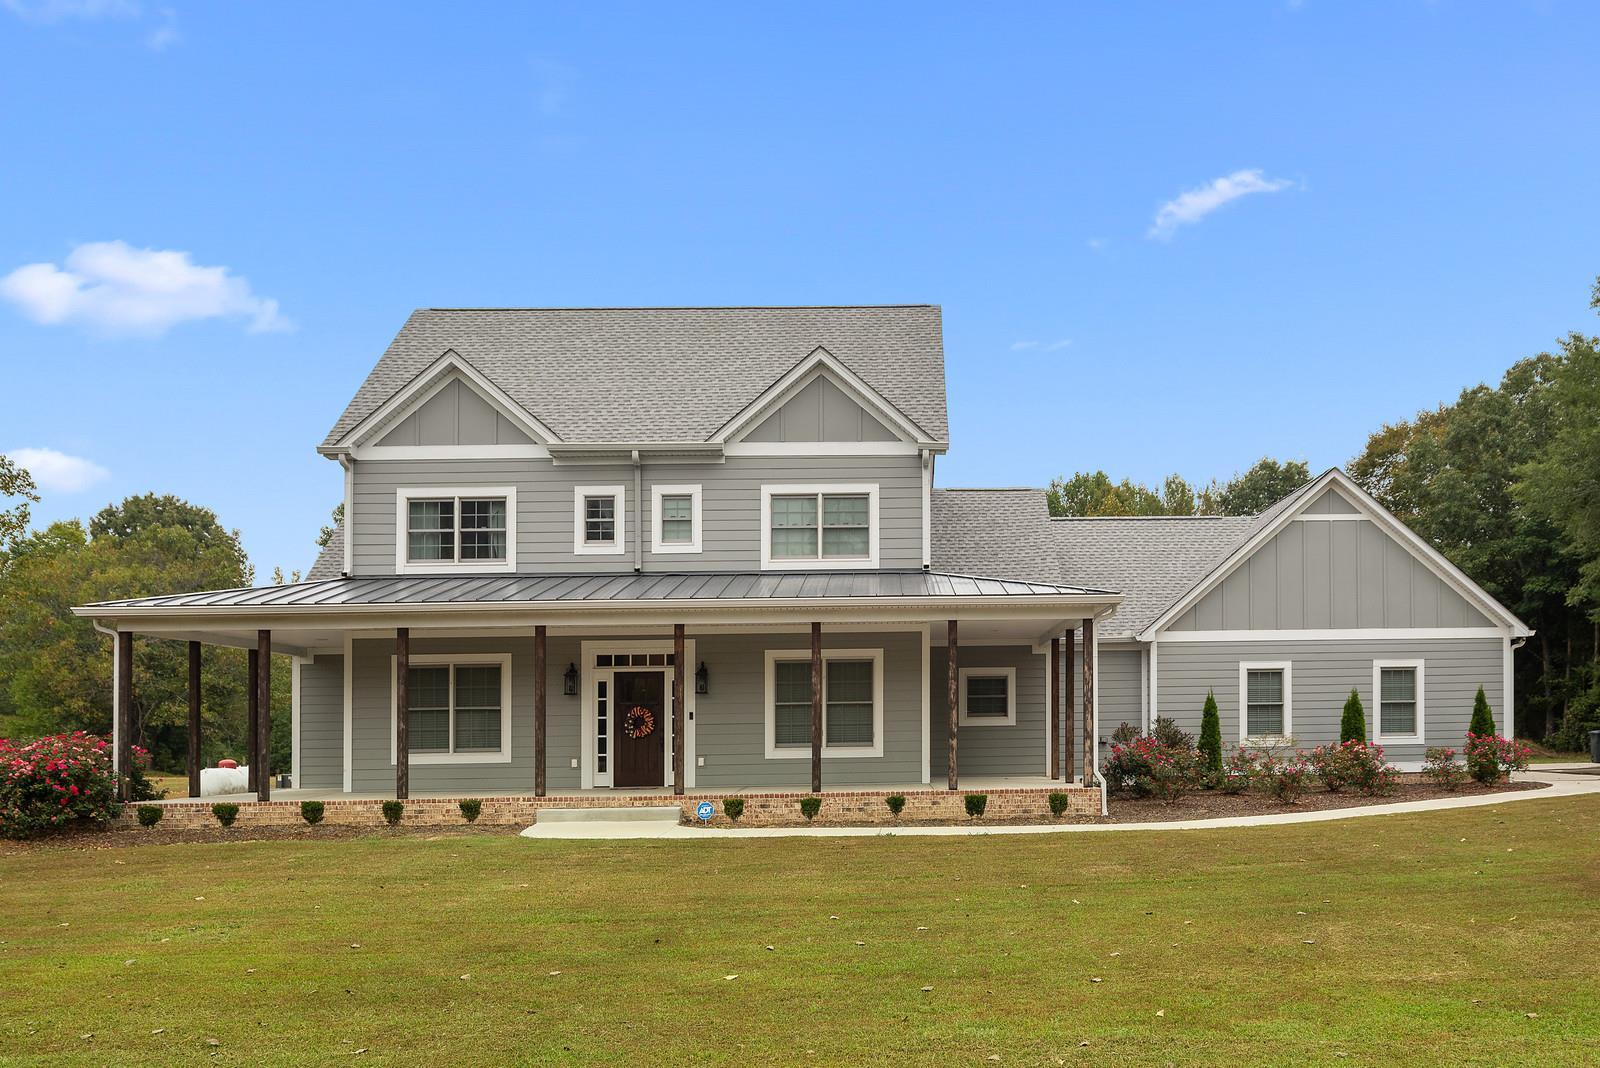 1346 Oaklawn Rd, Chapmansboro, TN 37035 - Chapmansboro, TN real estate listing